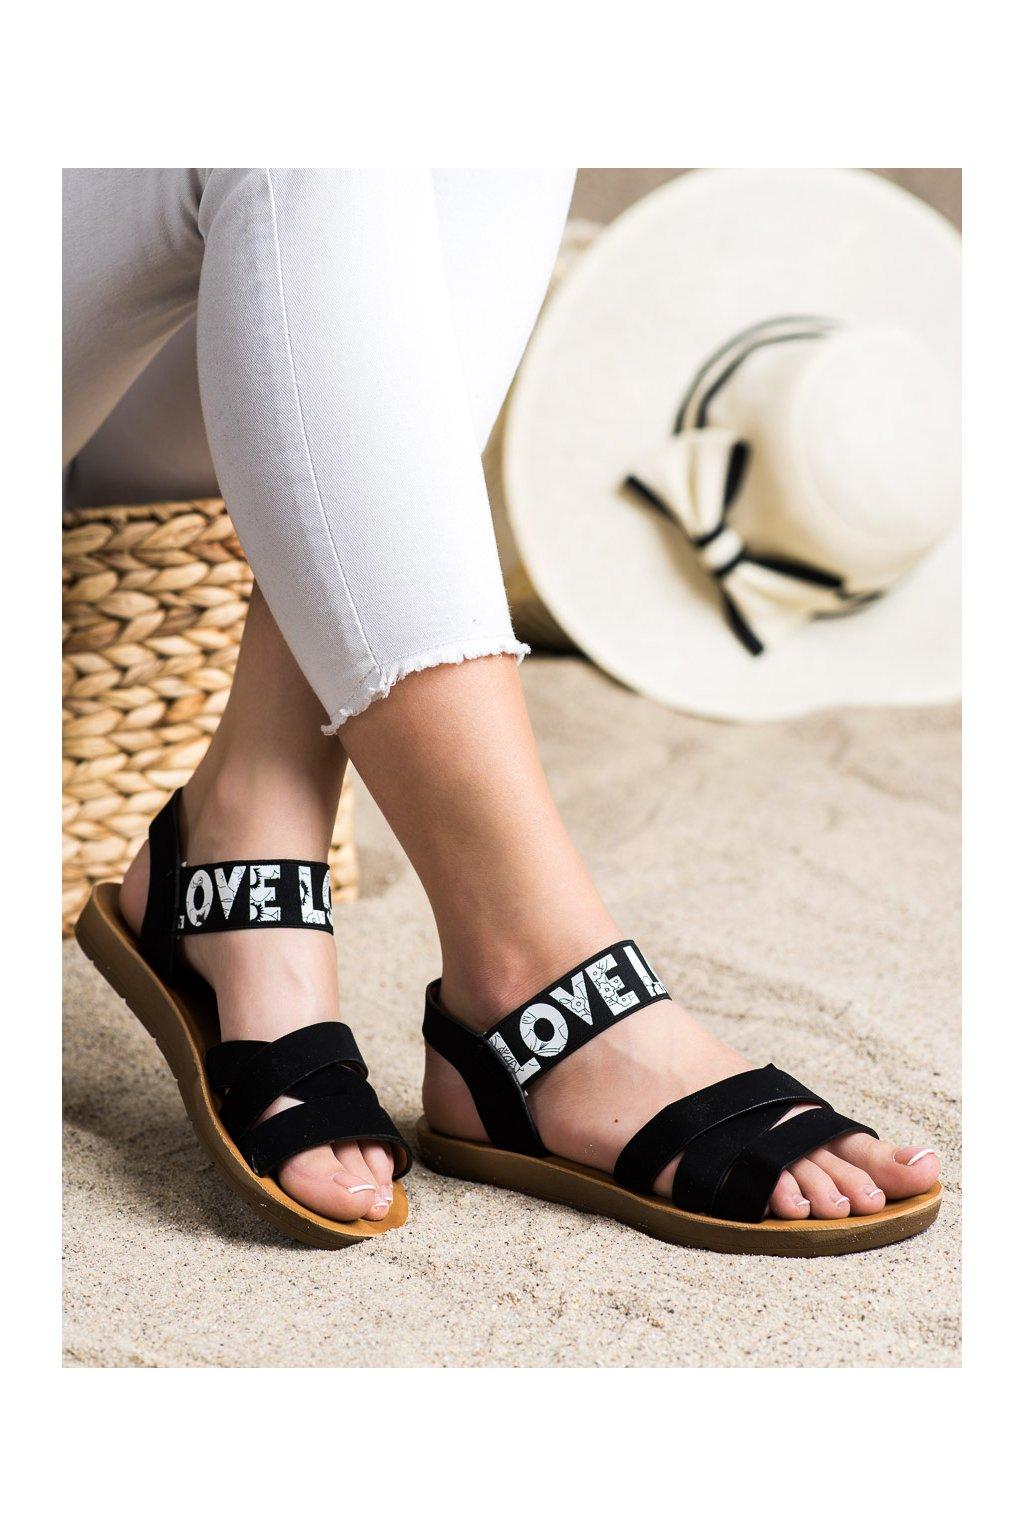 Čierne sandále Shelovet kod E1503B